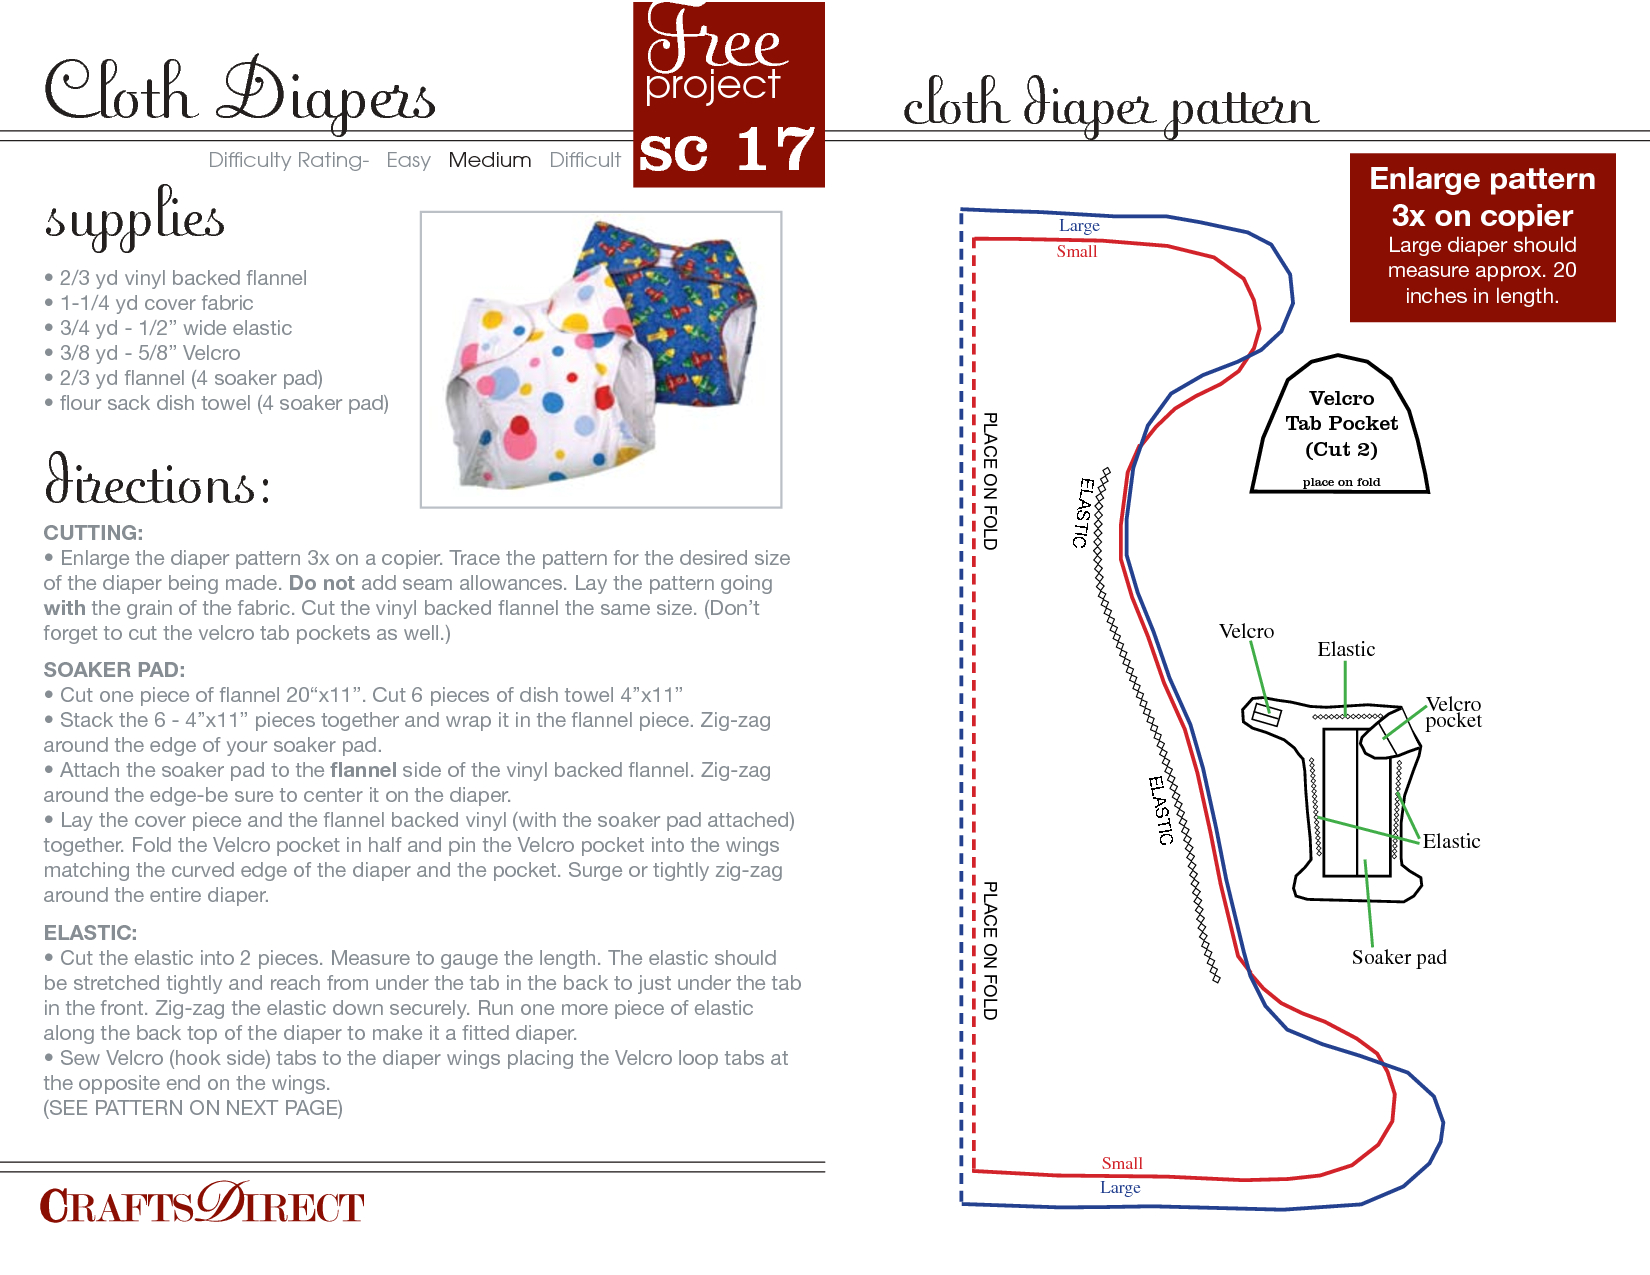 Free Cloth Diaper Patterns   Cloth Diaper Pattern_My Free Diaper - Cloth Diaper Pattern Free Printable